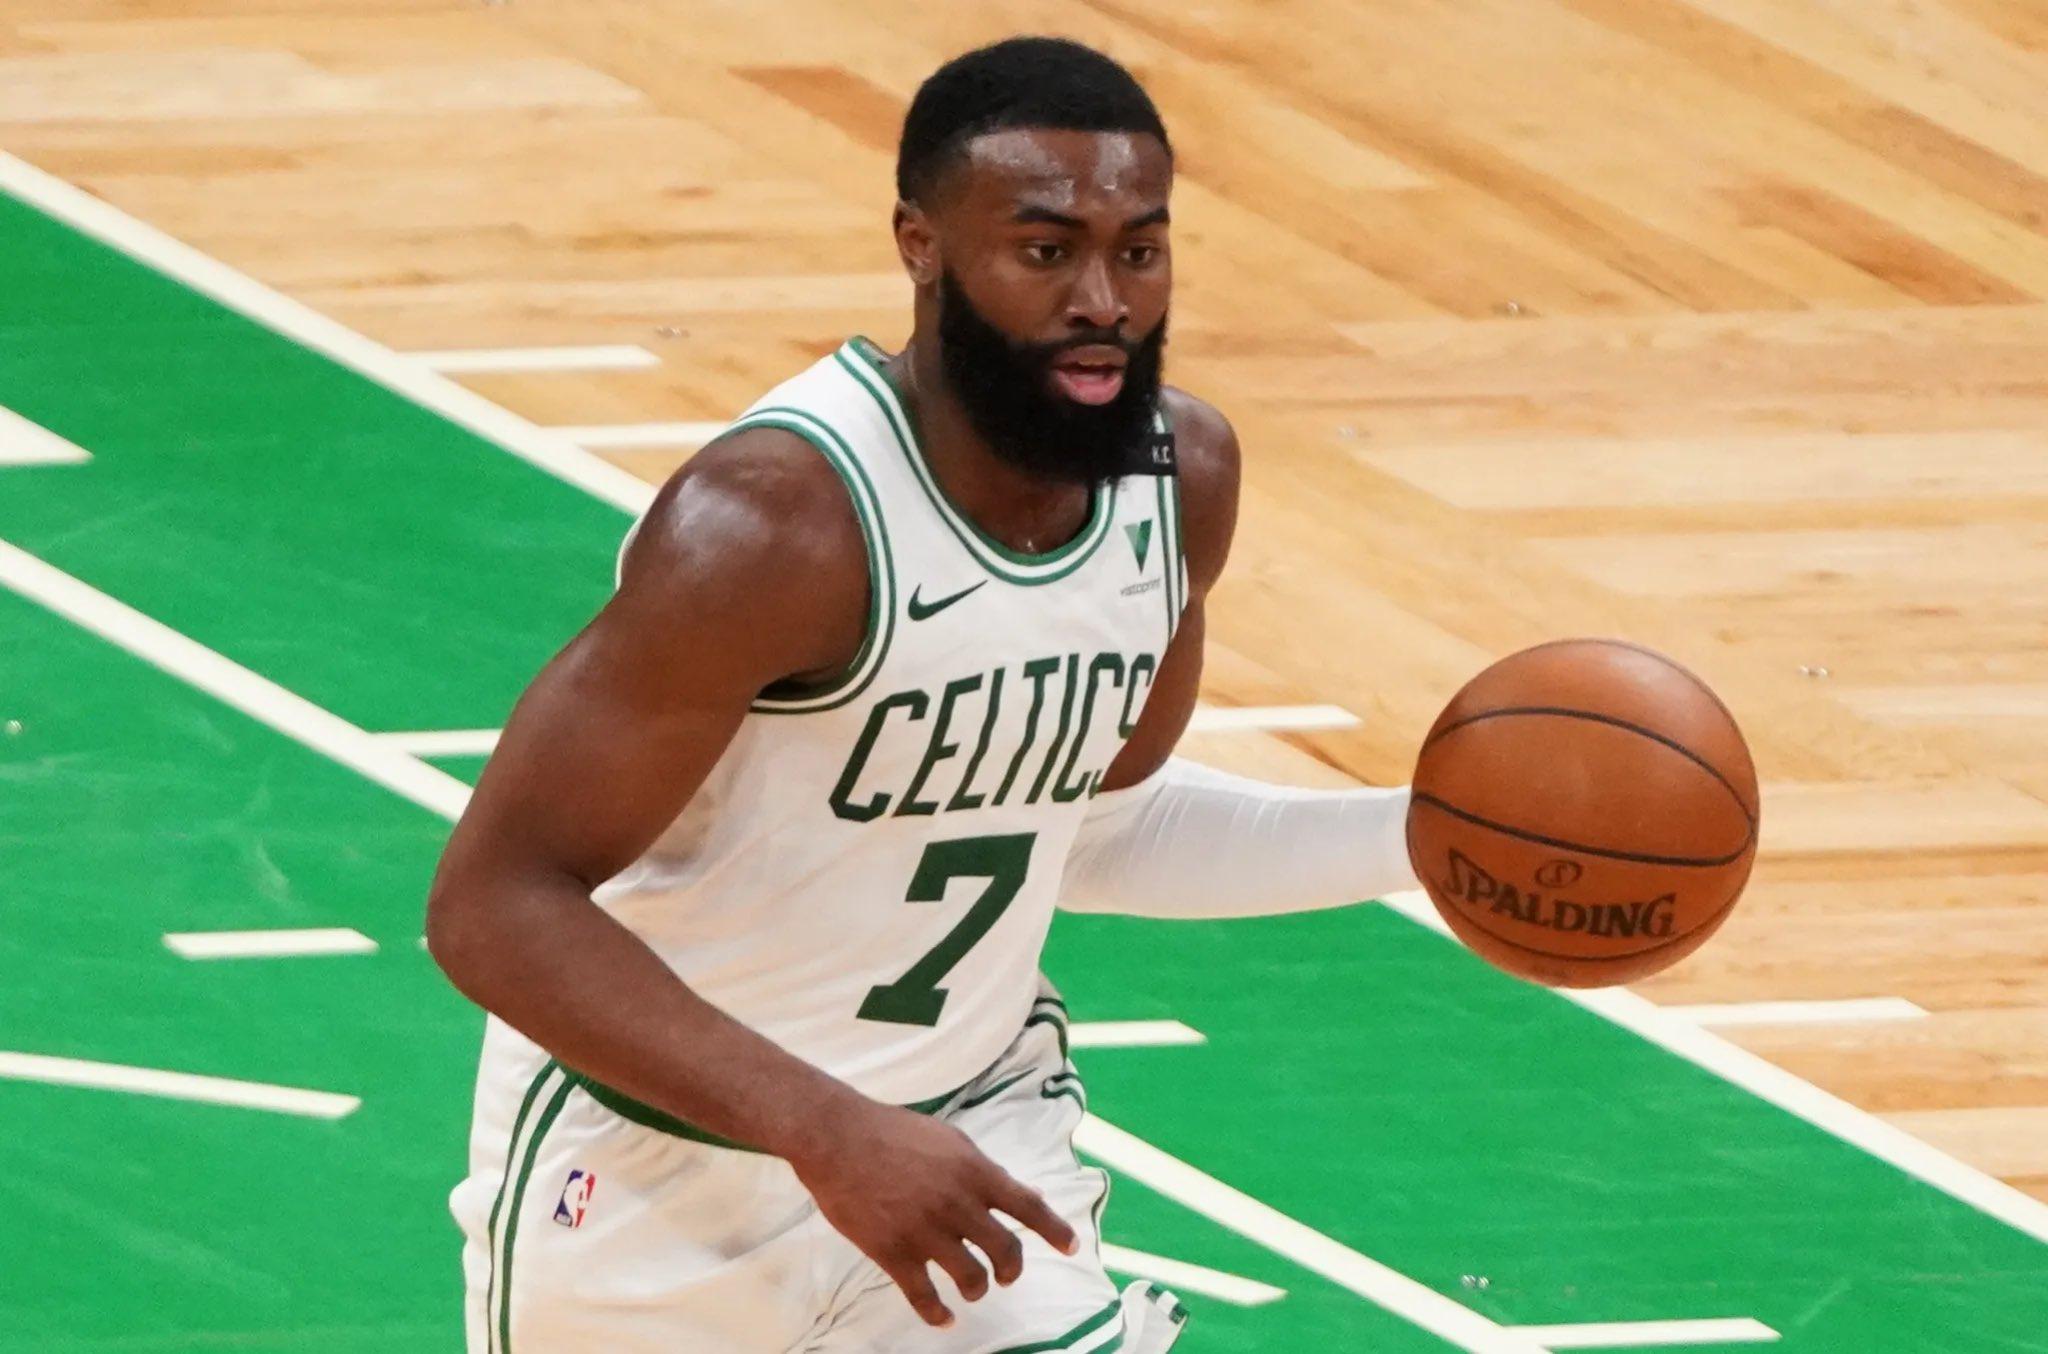 Celtics Photo,Celtics Twitter Trend : Most Popular Tweets